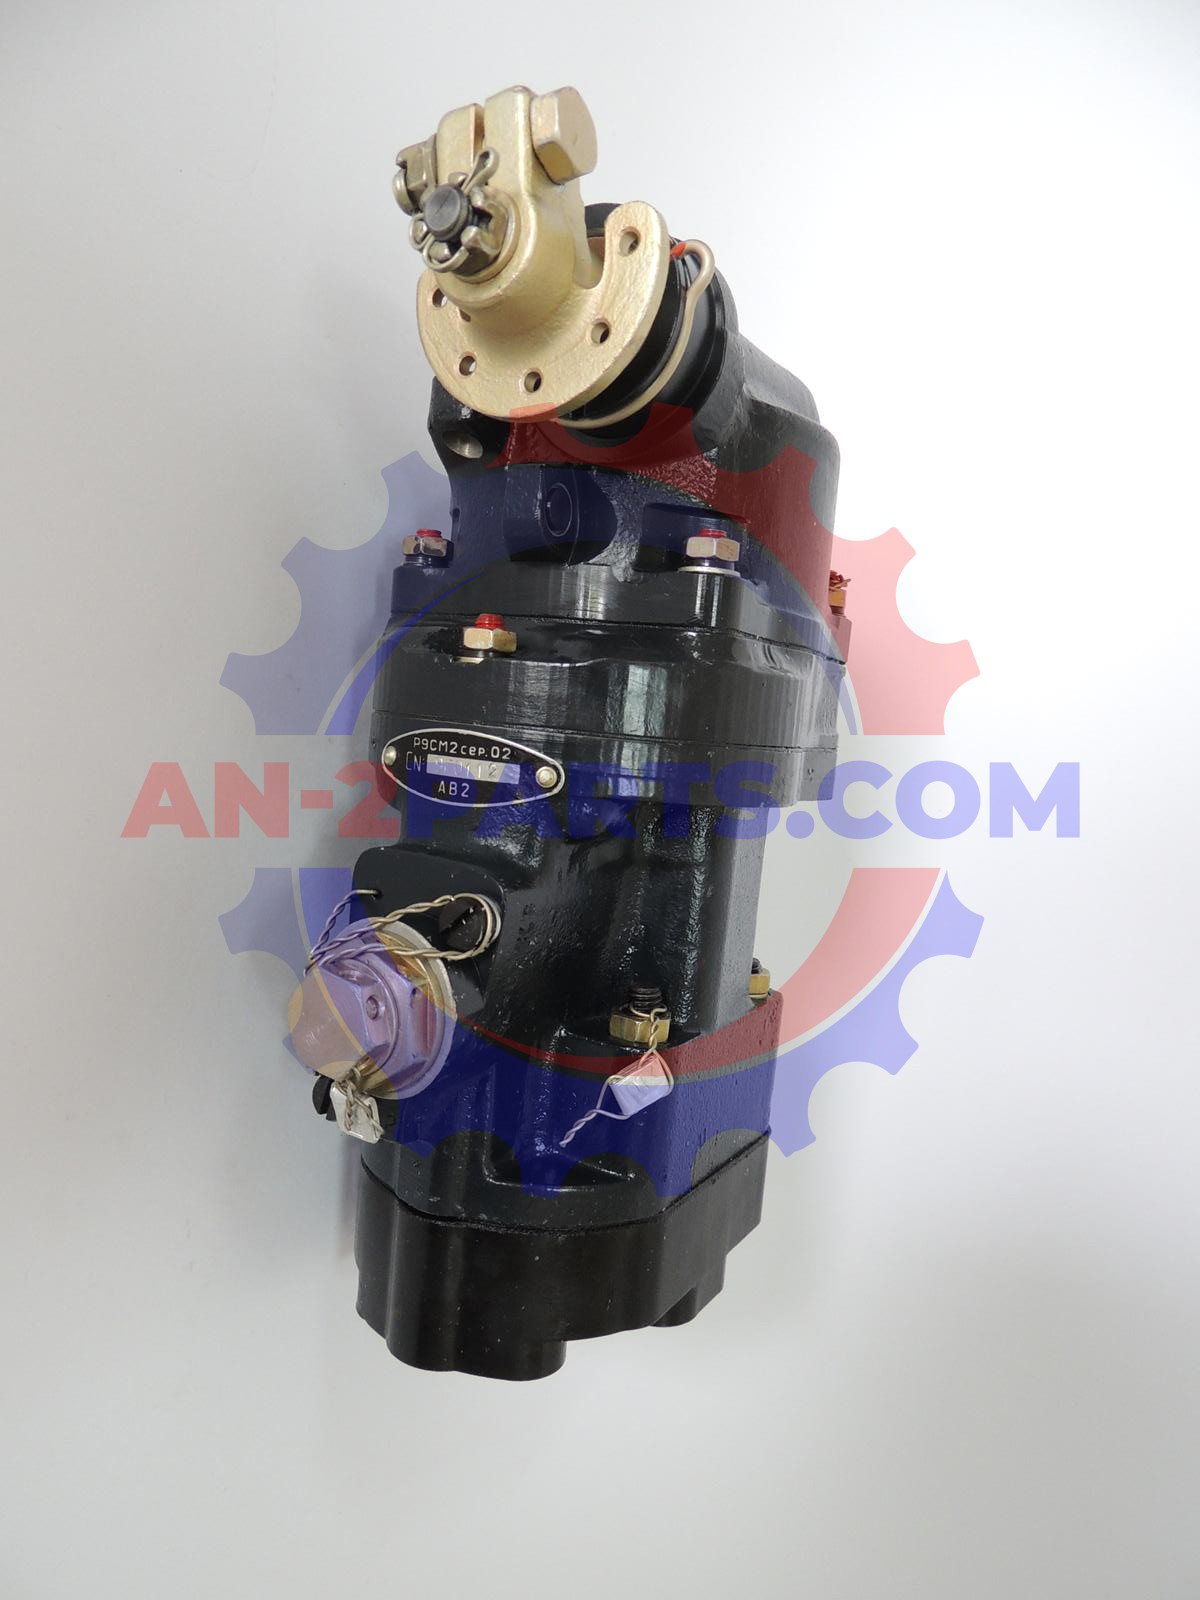 Regulator prędkości obrotowej R-9SM2 lub regulator prędkości obrotowej RW-101/M/, Speed governor R-9SM2 or Speed governor RW-101/M/